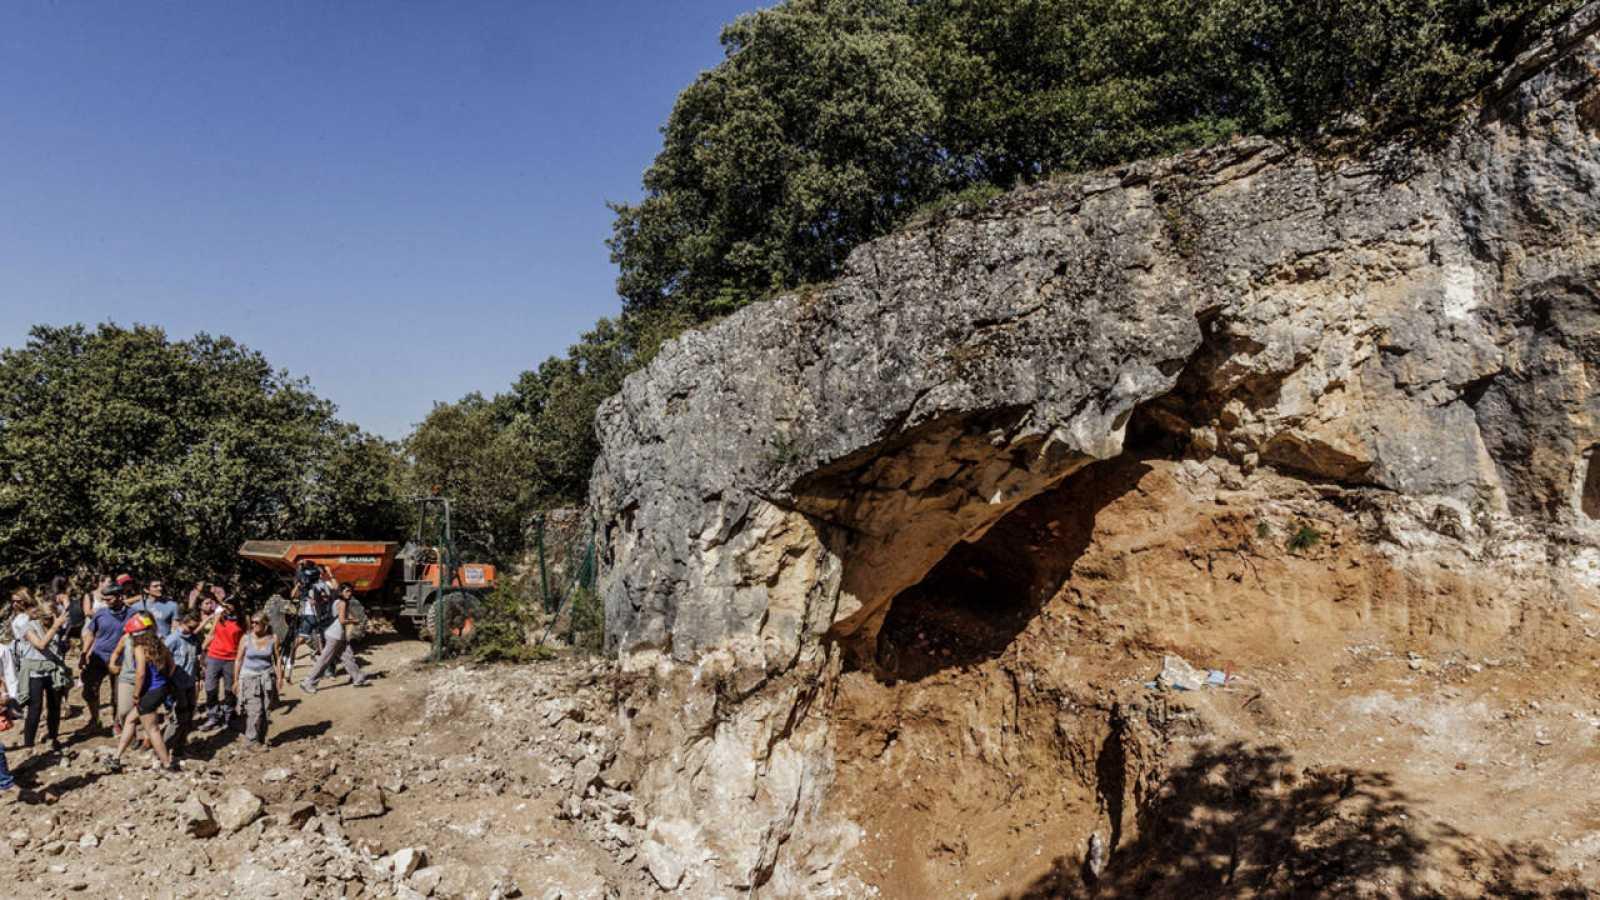 La Cueva Fantasma se ubica junto a la Sima del Elefante, en la Trinchera del Ferrocarril.